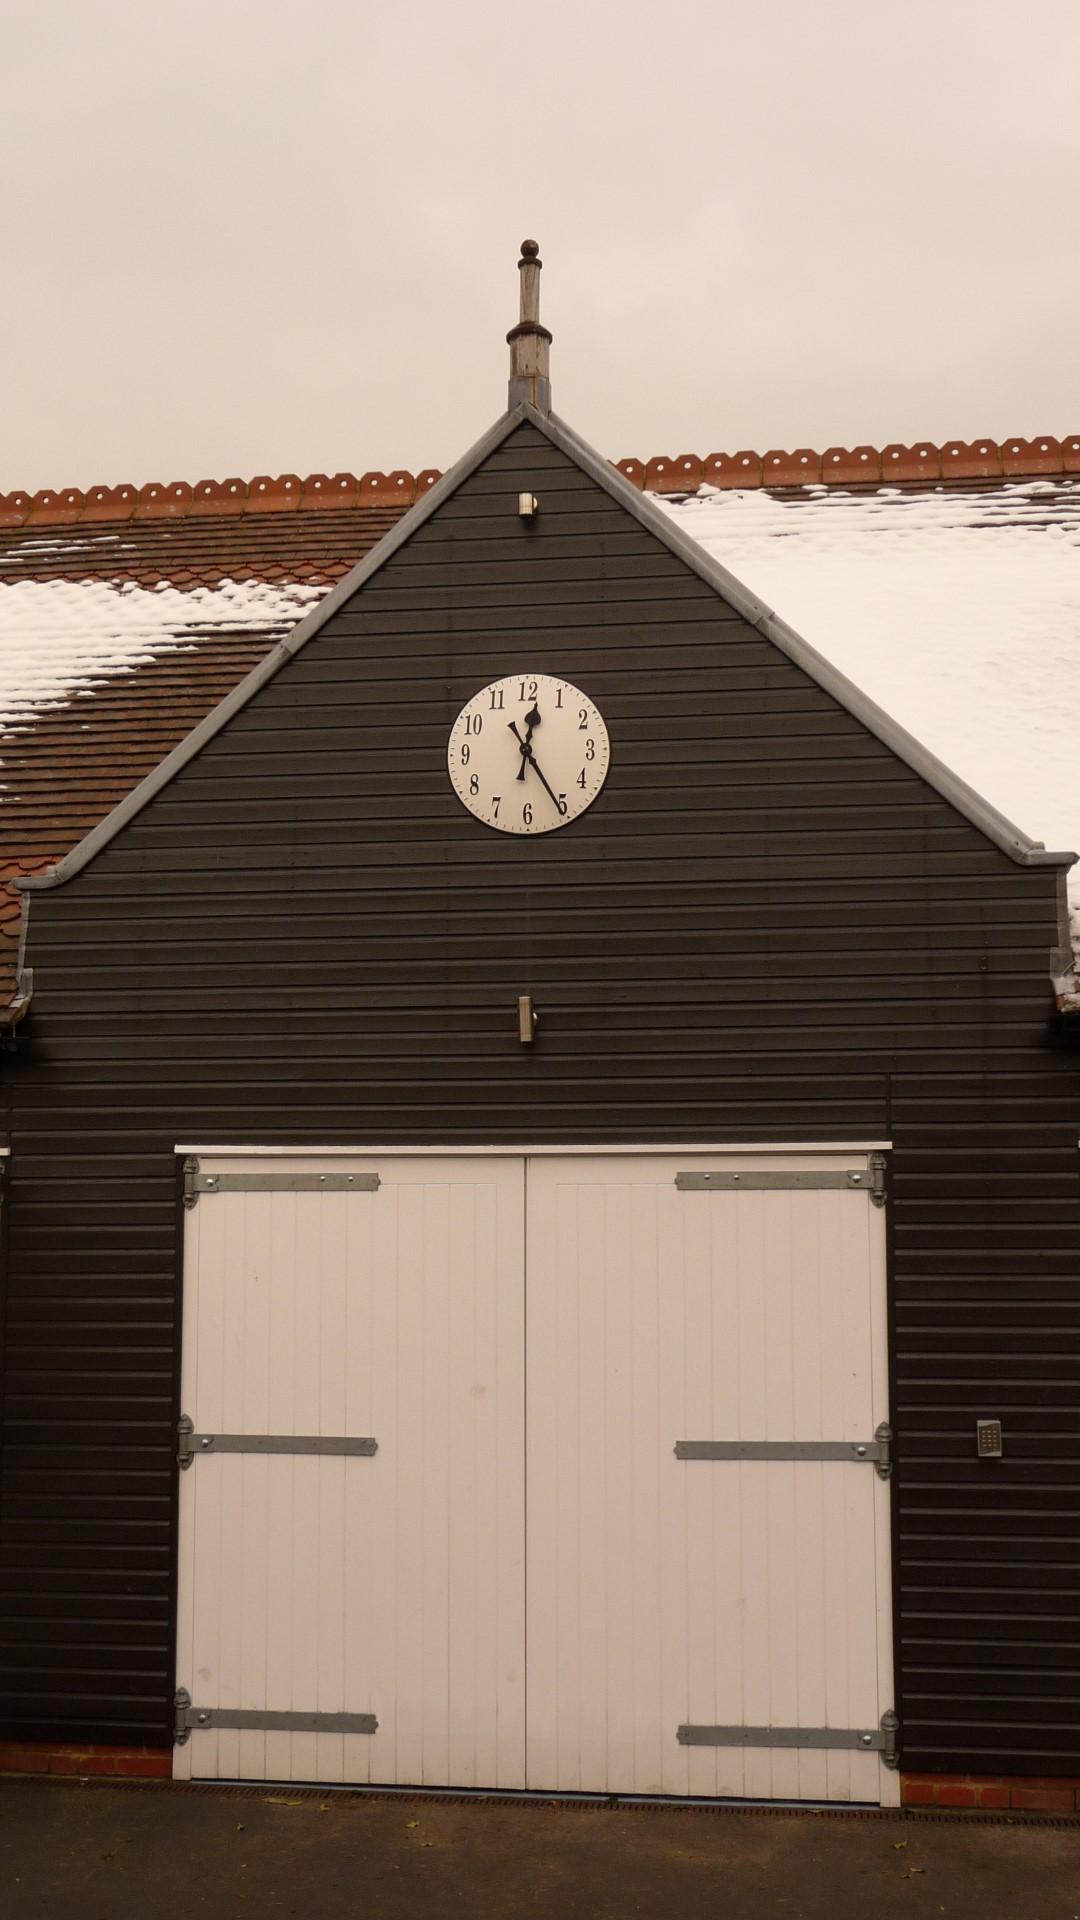 White Arabic style clock